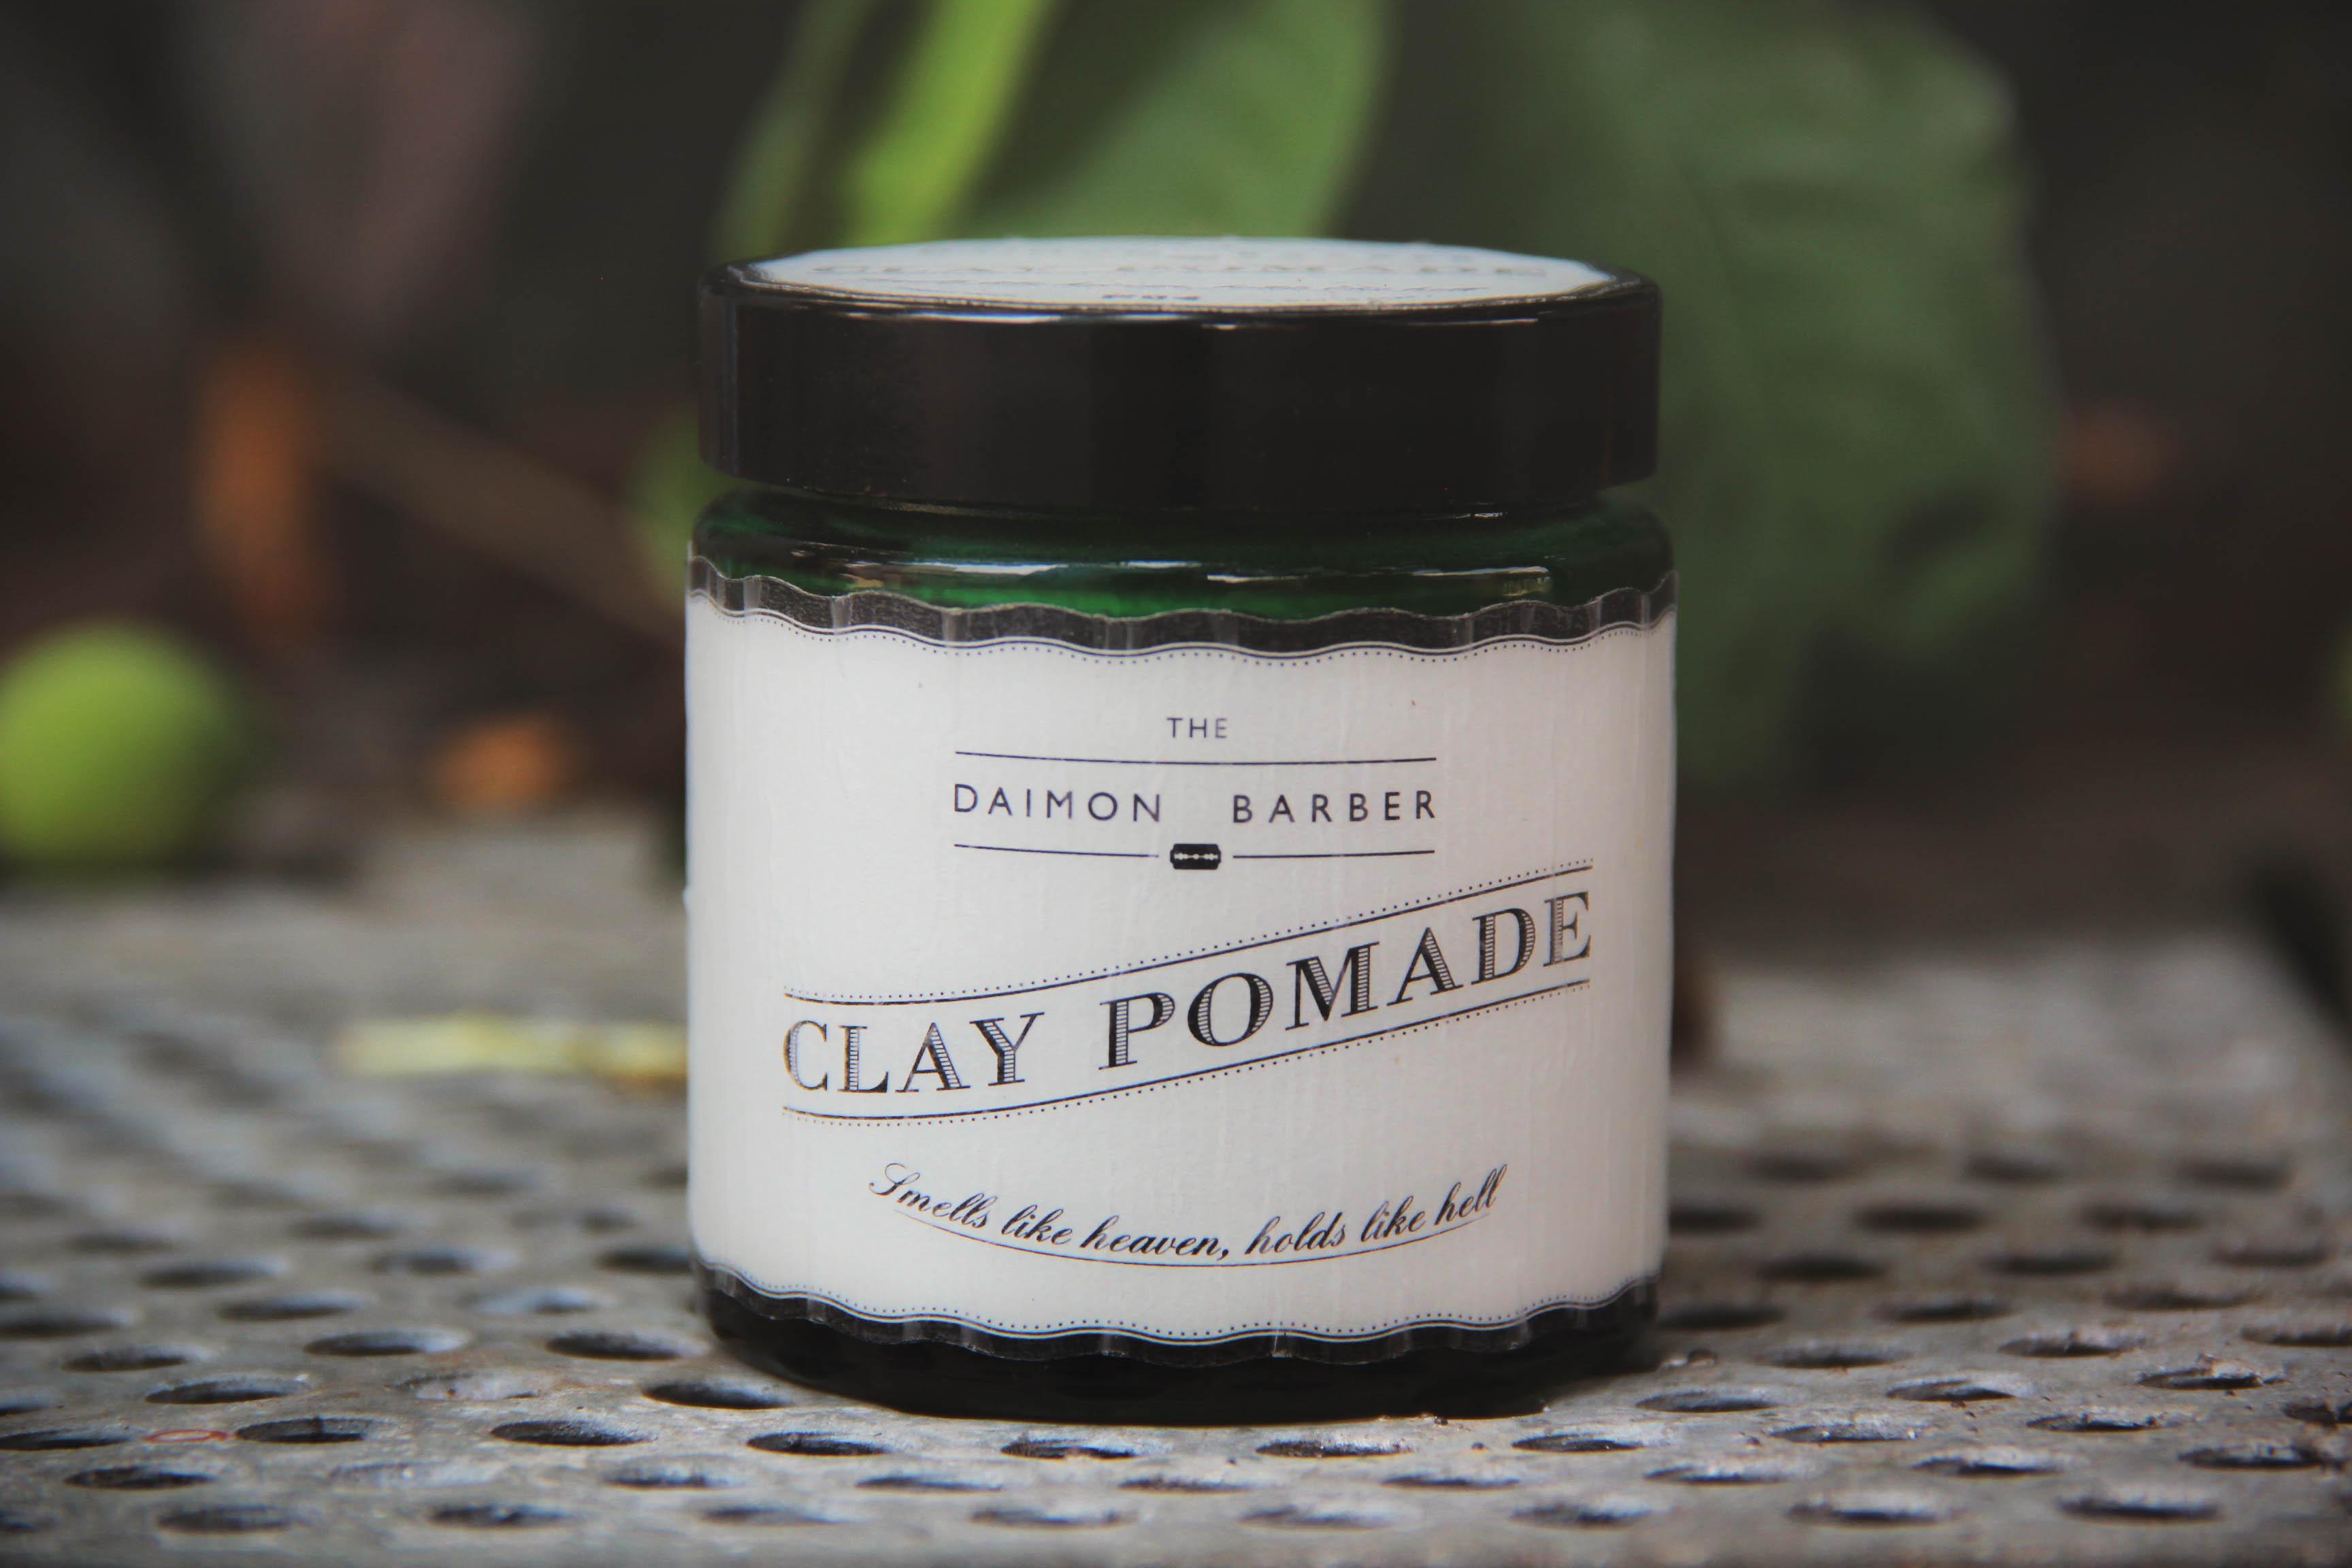 The Daimon Barber No.4 Clay